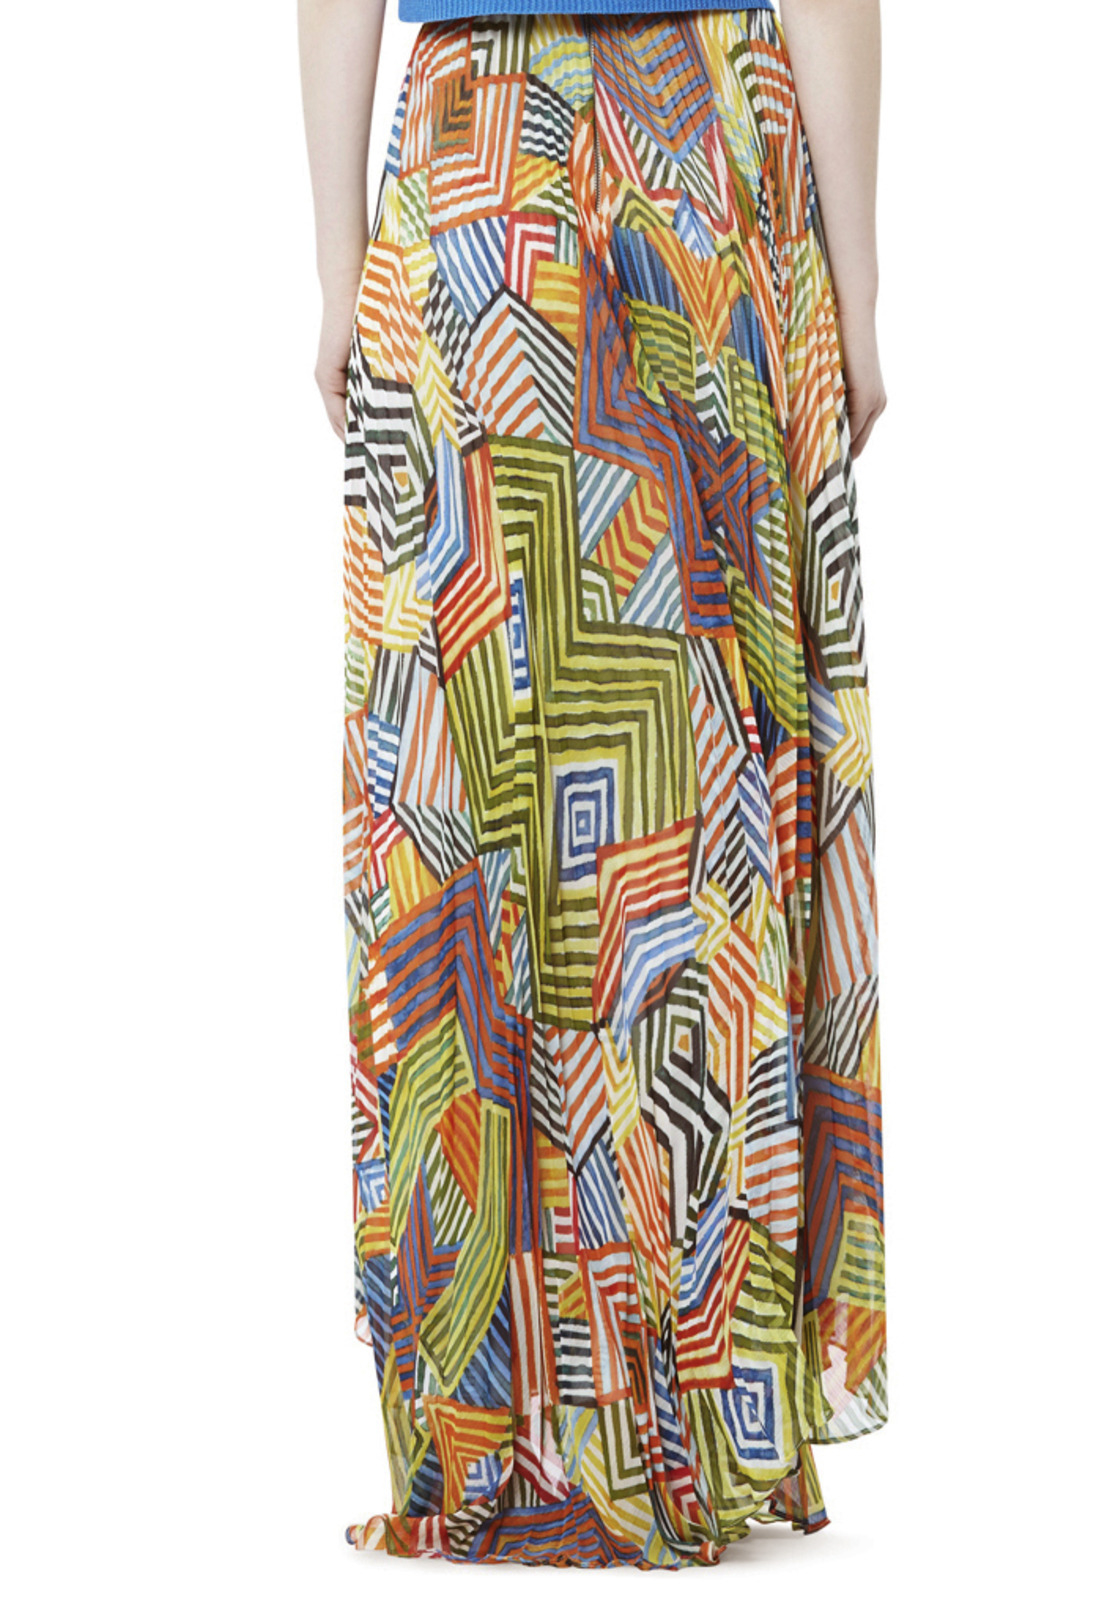 0ad6135fd8 Alice + Olivia Shannon Pleated Maxi Skirt - Lyst